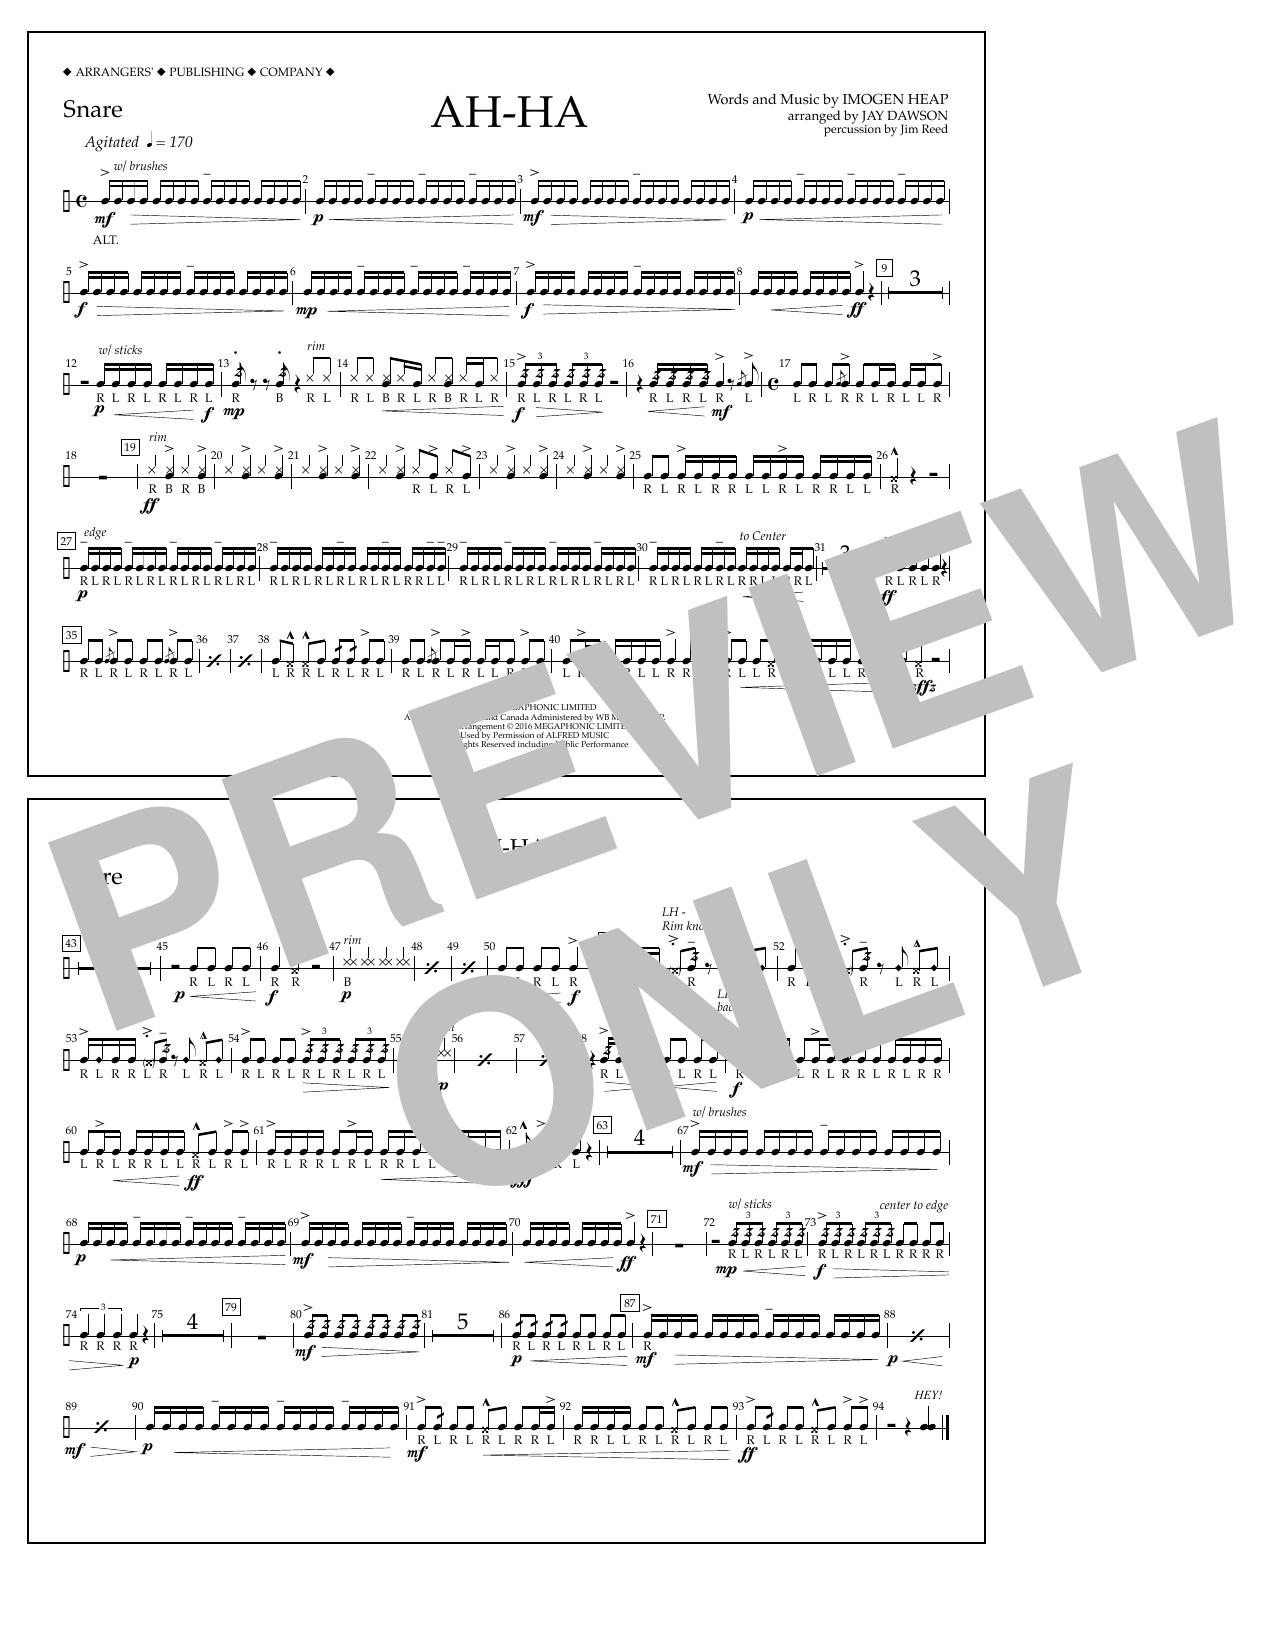 Jay Dawson Ah-ha - Snare sheet music notes and chords. Download Printable PDF.